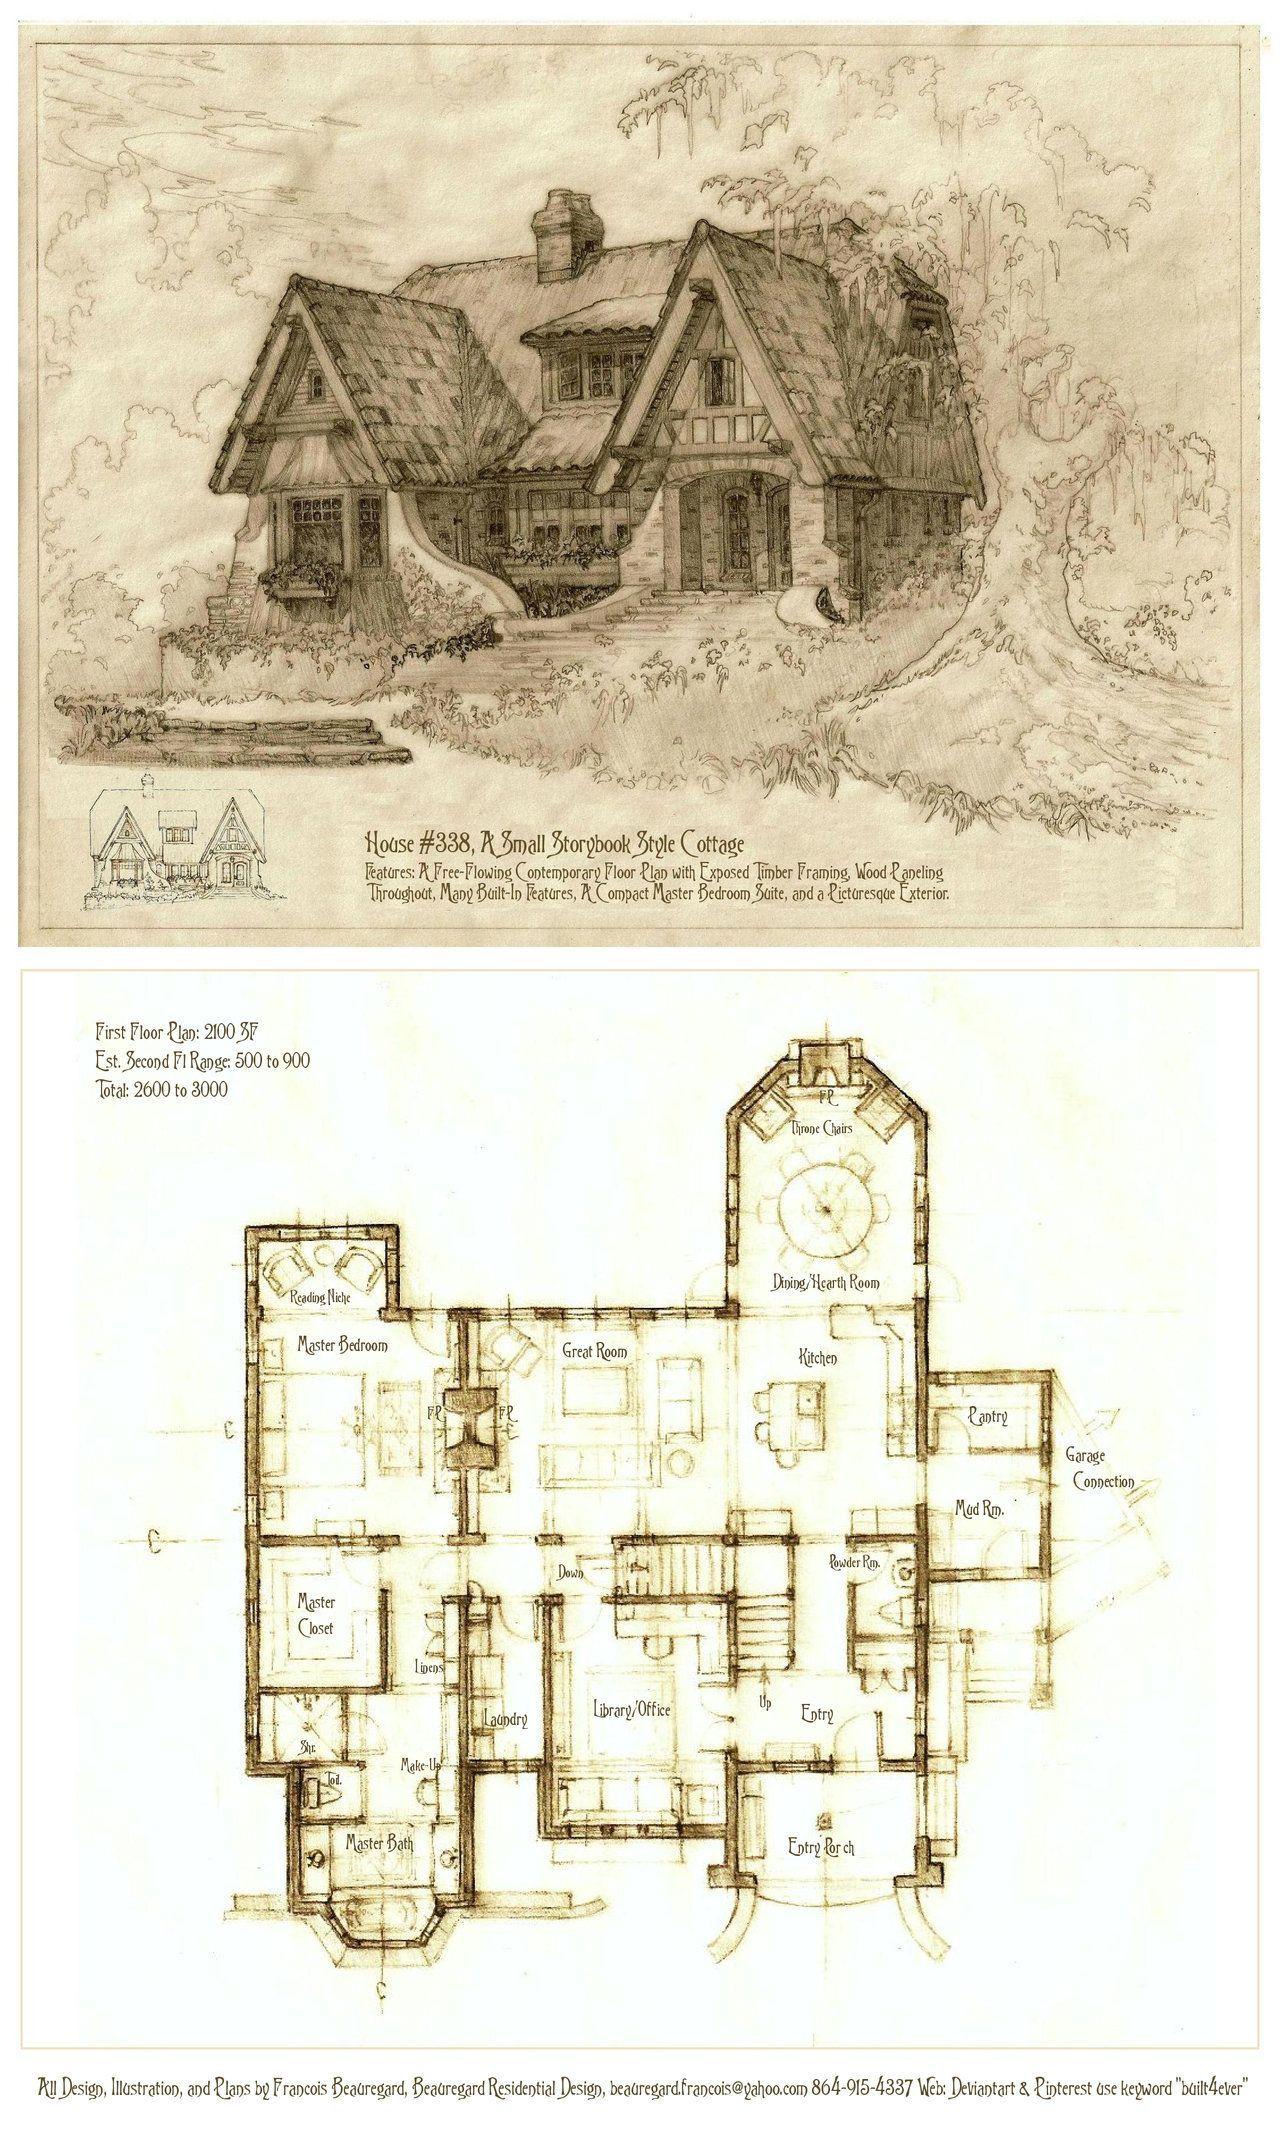 Free Online House Plans Design Your Own 2020 Rumah Impian Rumah Impian